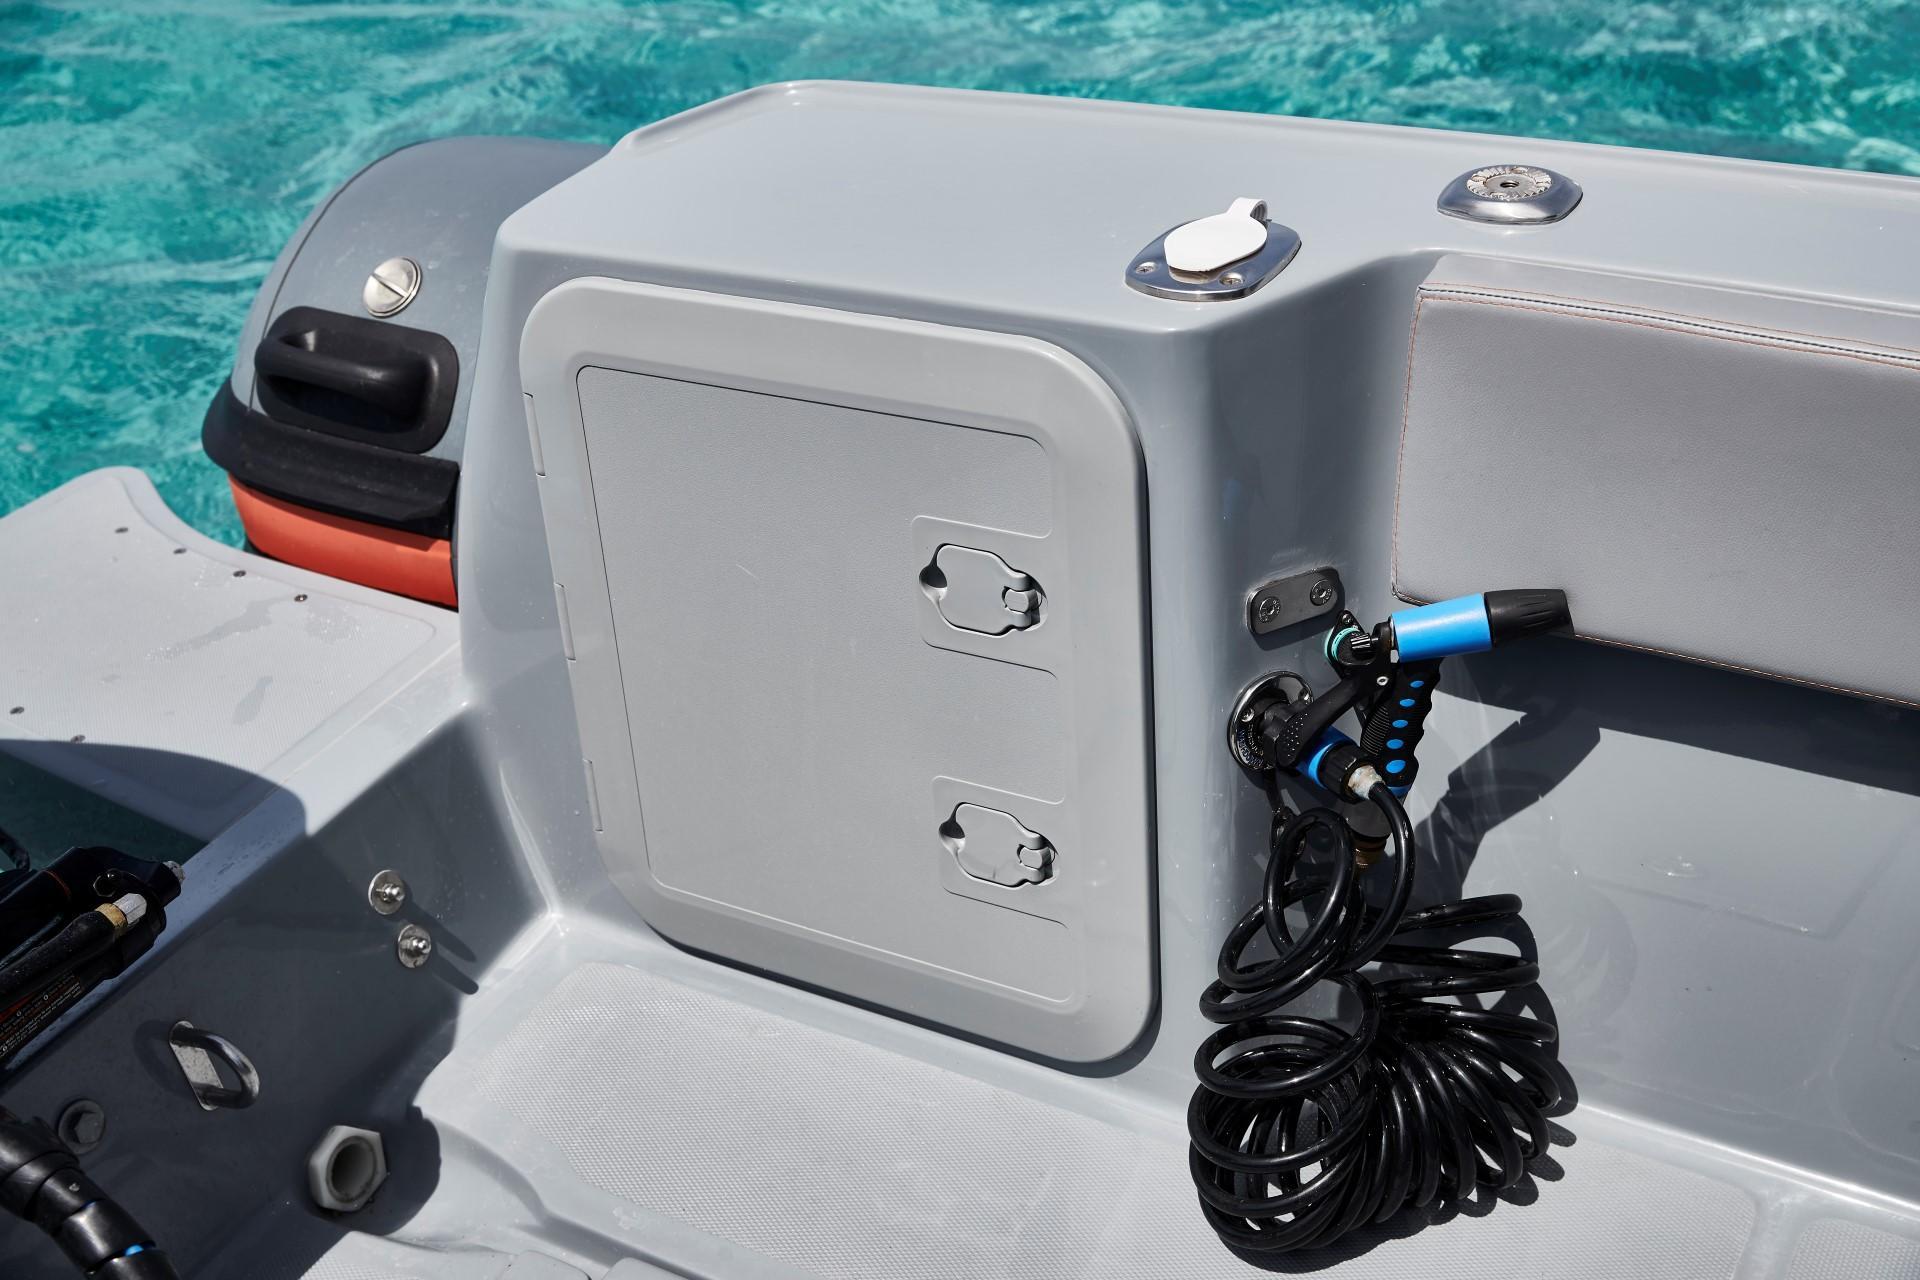 Joker Boat Barracuda high pressure deck wash